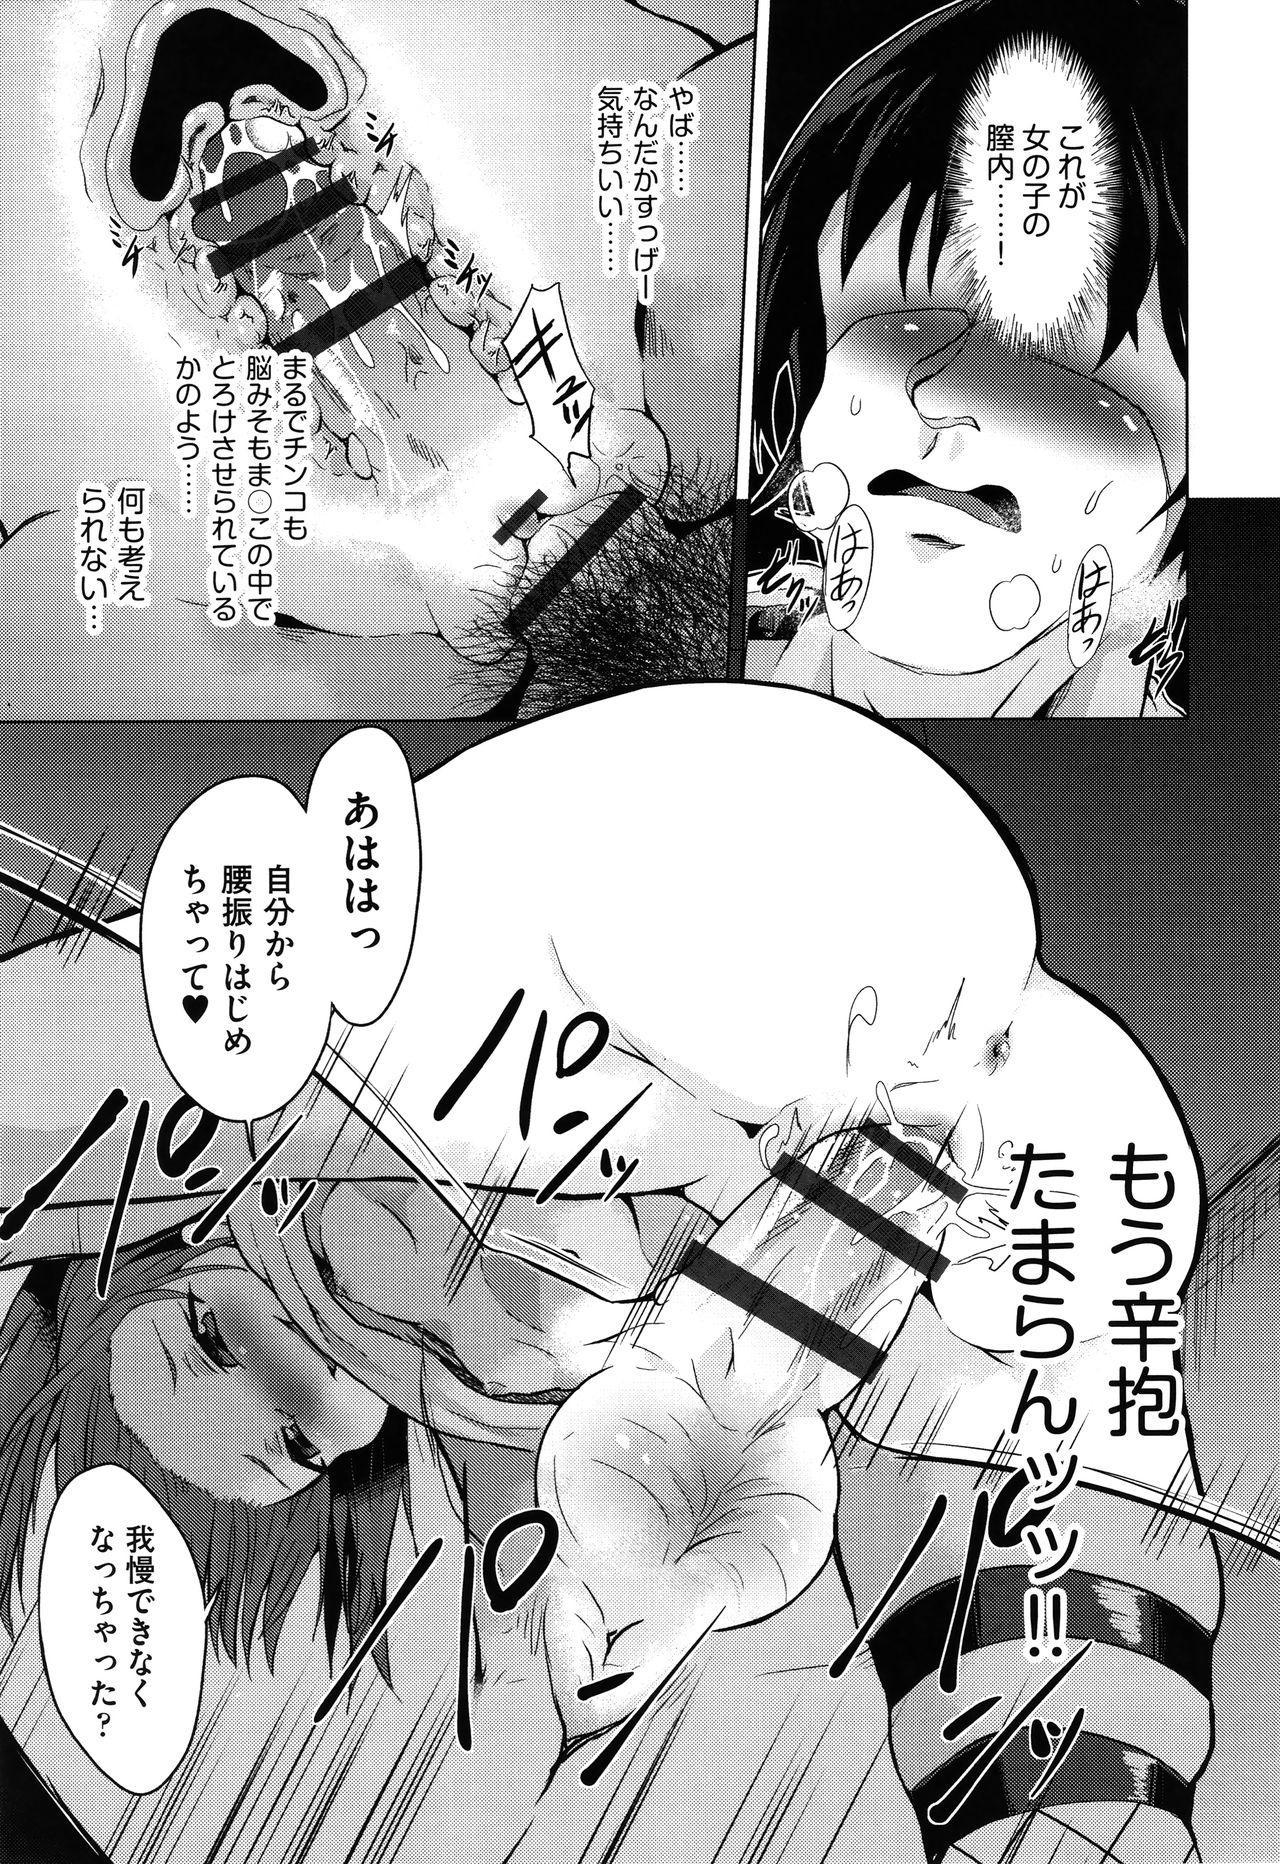 Shoujo Kumikyoku 17 47